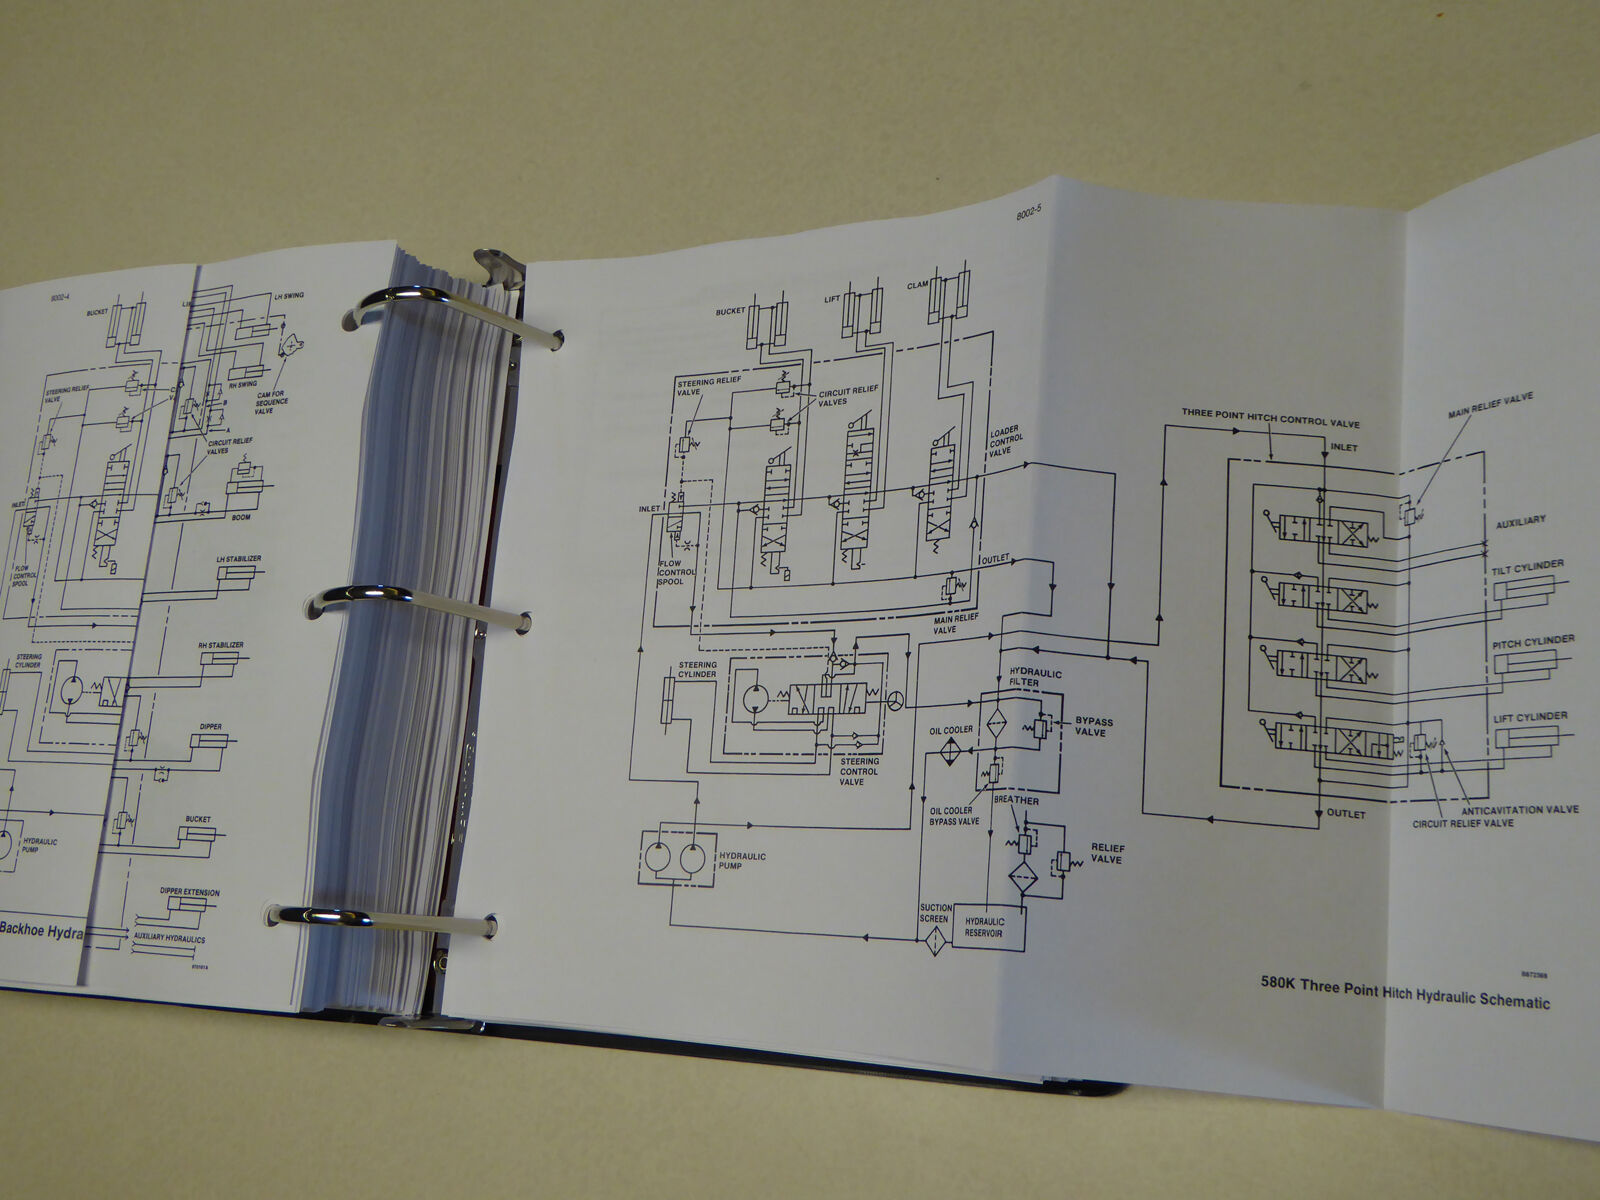 Attractive Wiring Model Schematic 580 32782 Model - Wiring Diagram ...